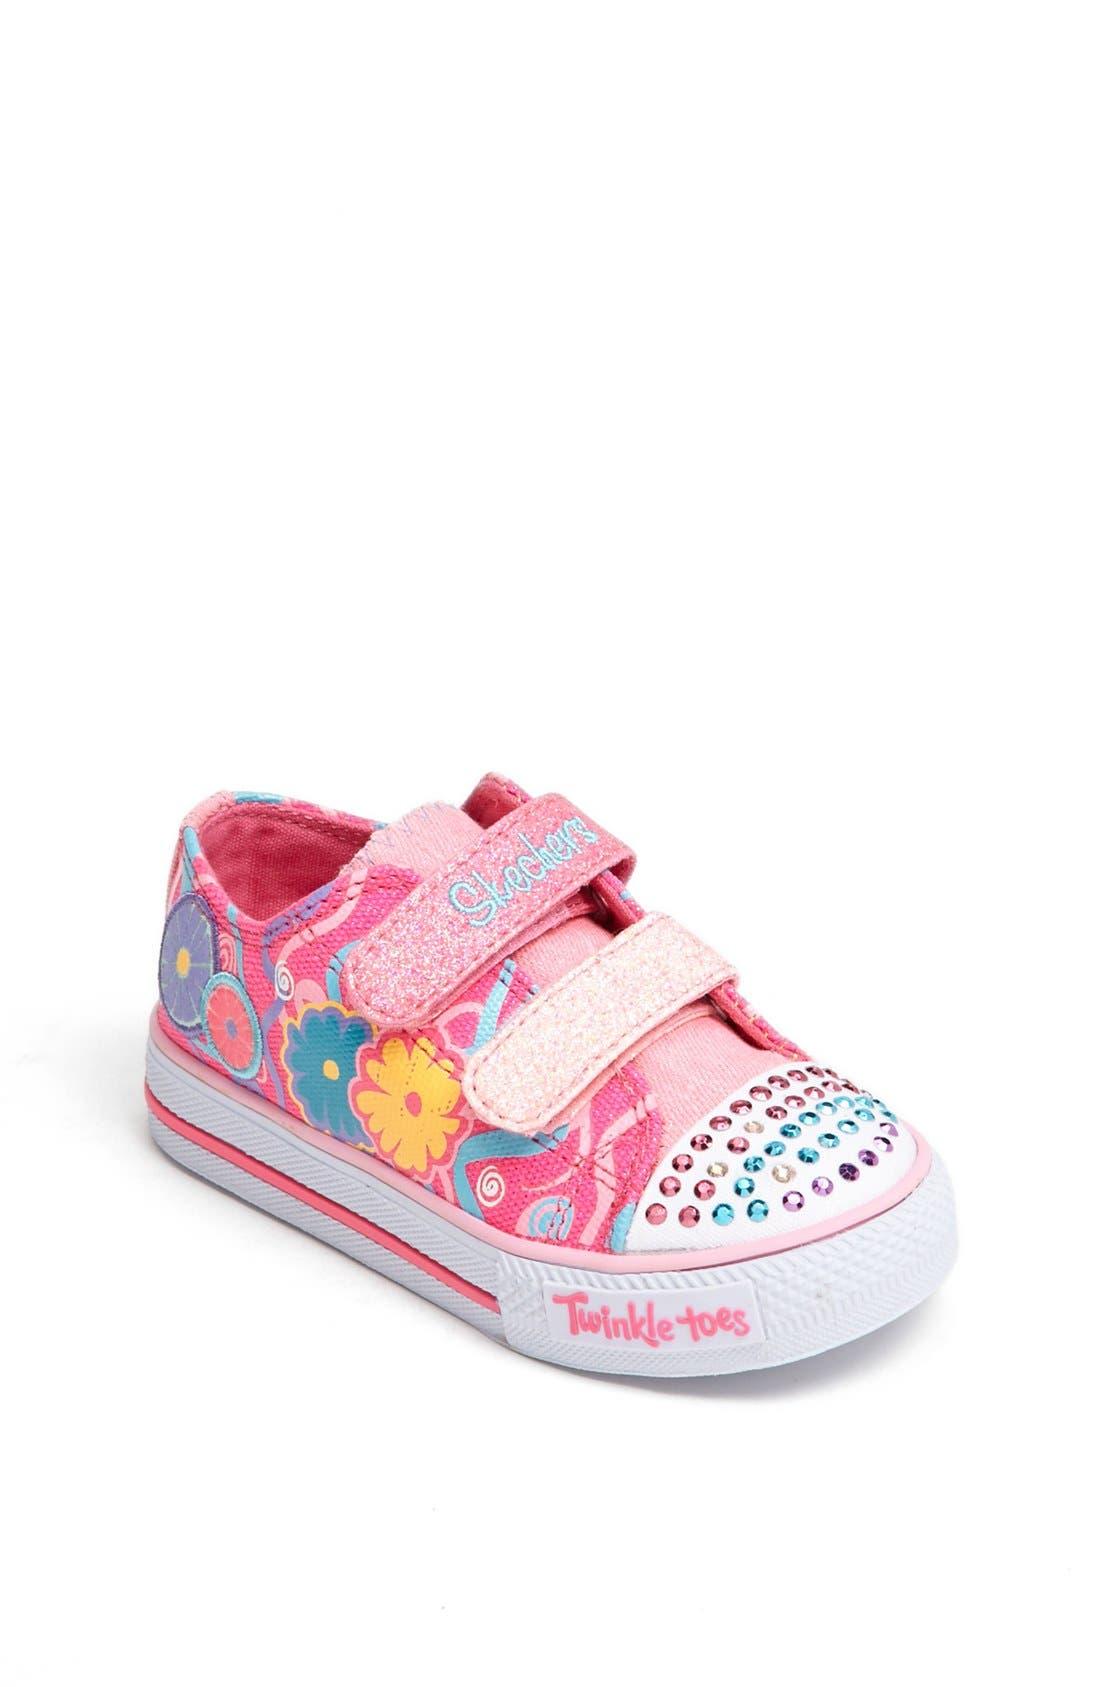 Main Image - SKECHERS 'Twinkle Toes - Sweet Talk' Light-Up Sneaker (Walker & Toddler)